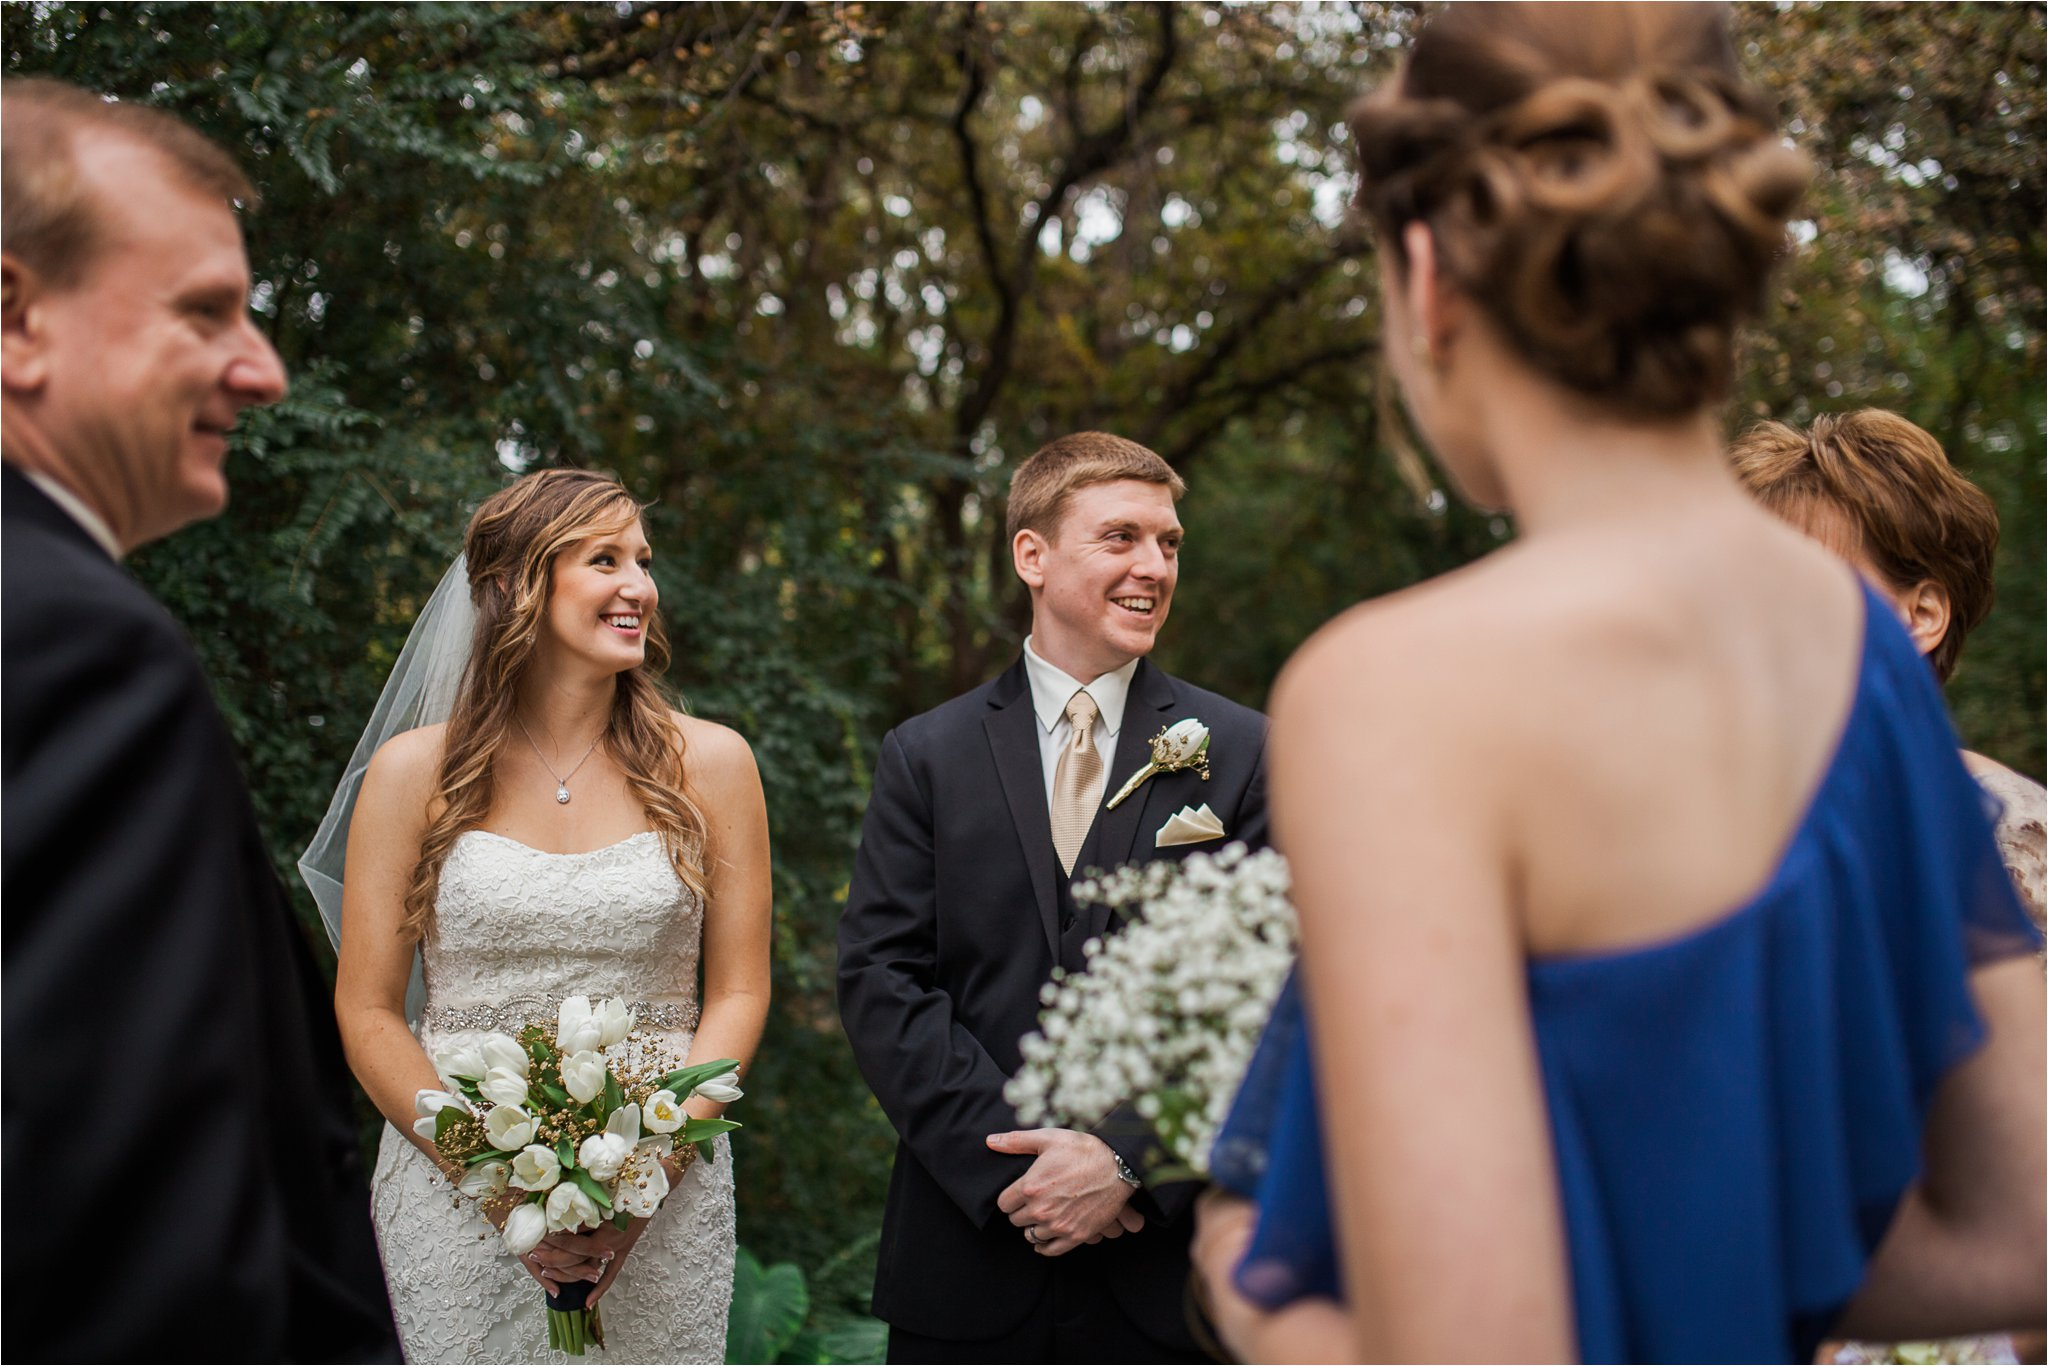 lunsford-wedding-675.jpg